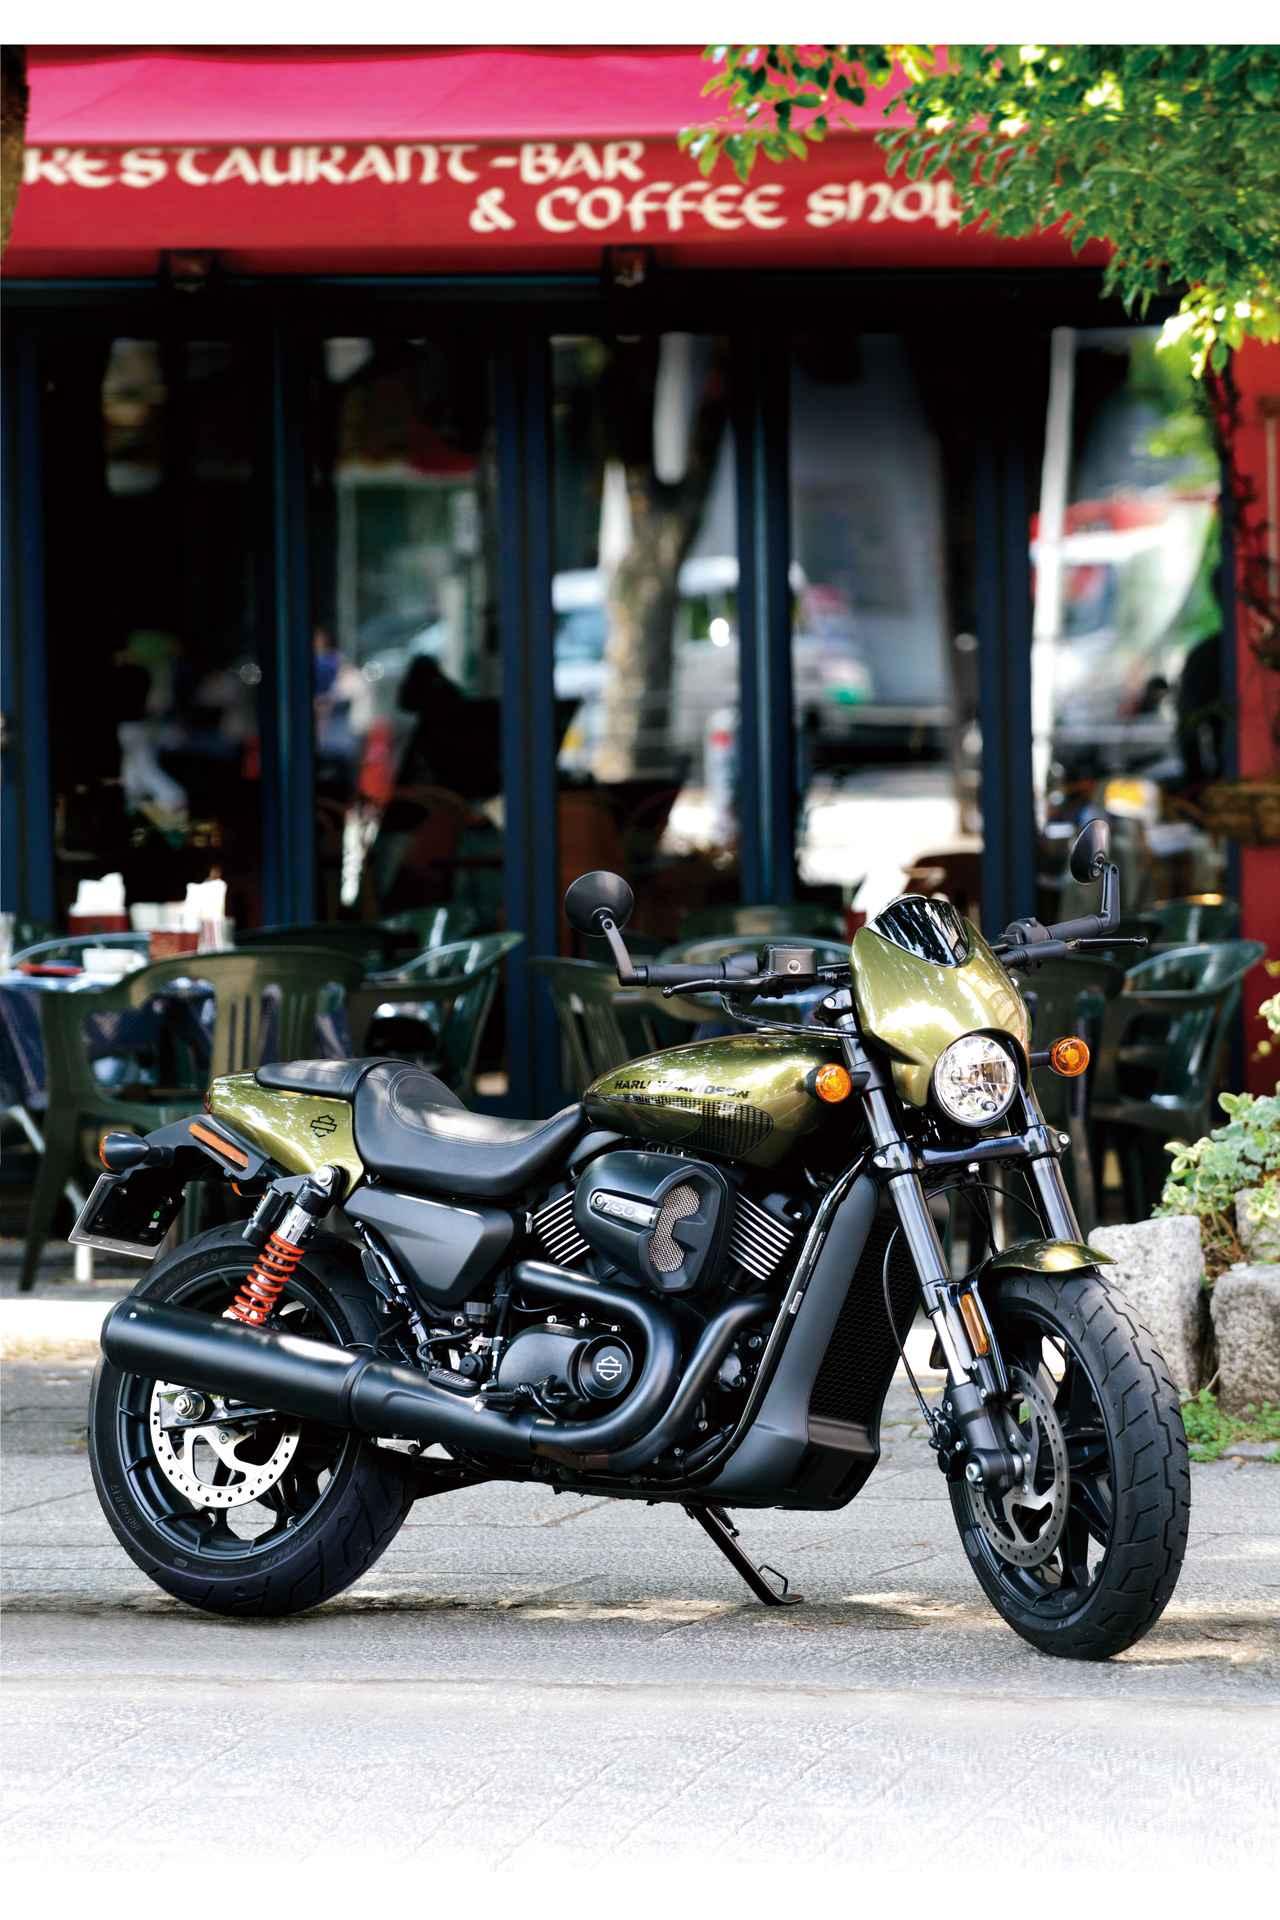 Images : 1番目の画像 - HARLEY-DAVIDSON STREET ROD[XG750A] - webオートバイ